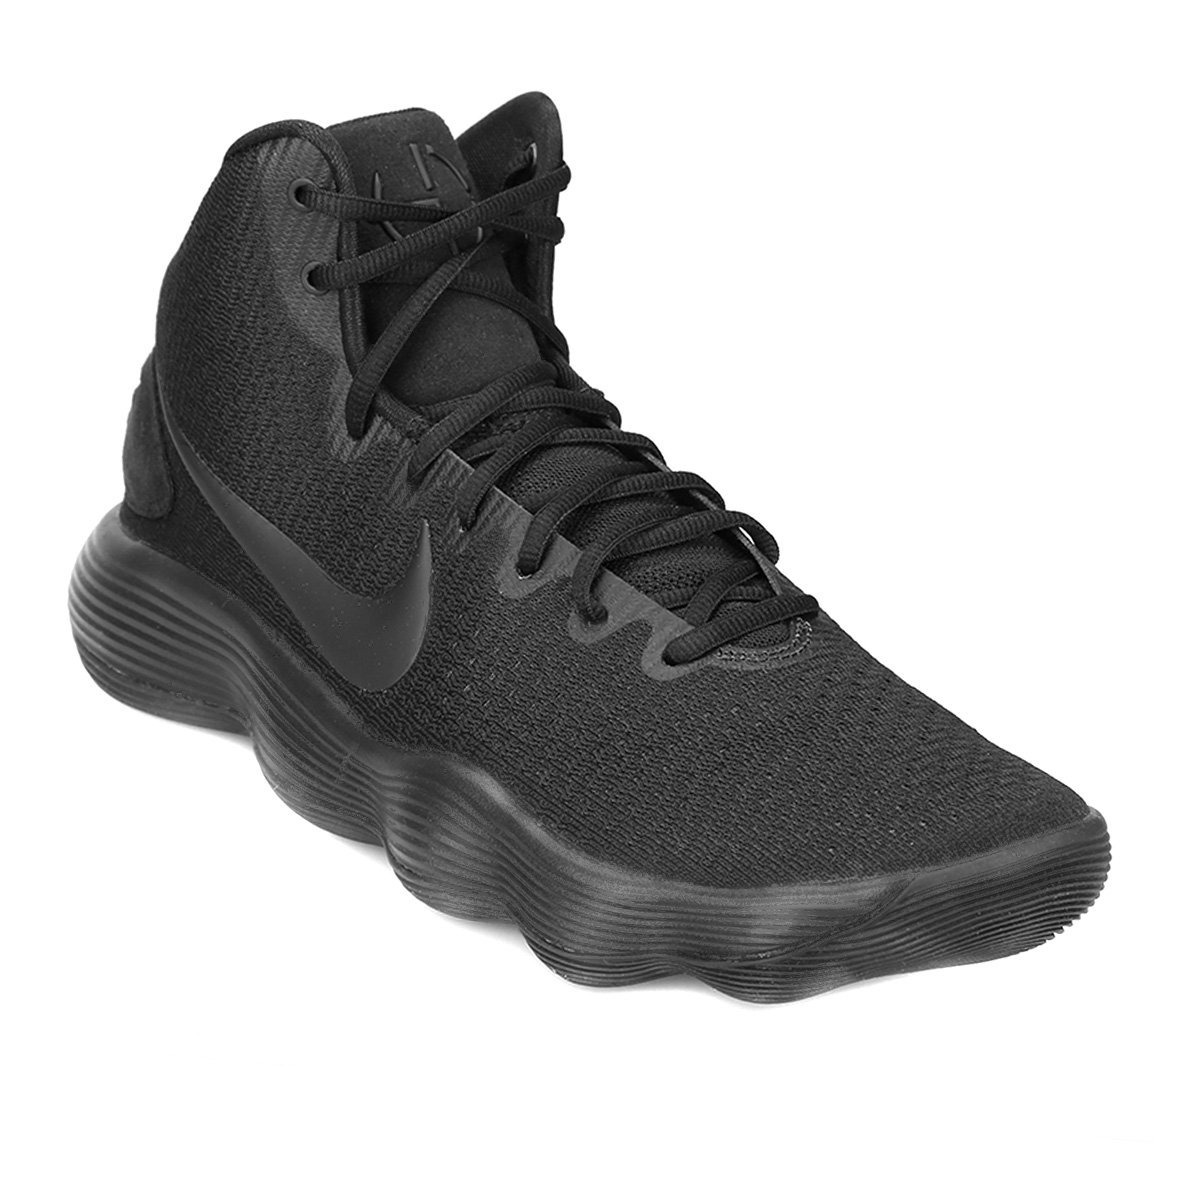 1ad7aa619c22 Nike Hyperdunk 2017(importadas A Pedido Y En Stock) -   4.300